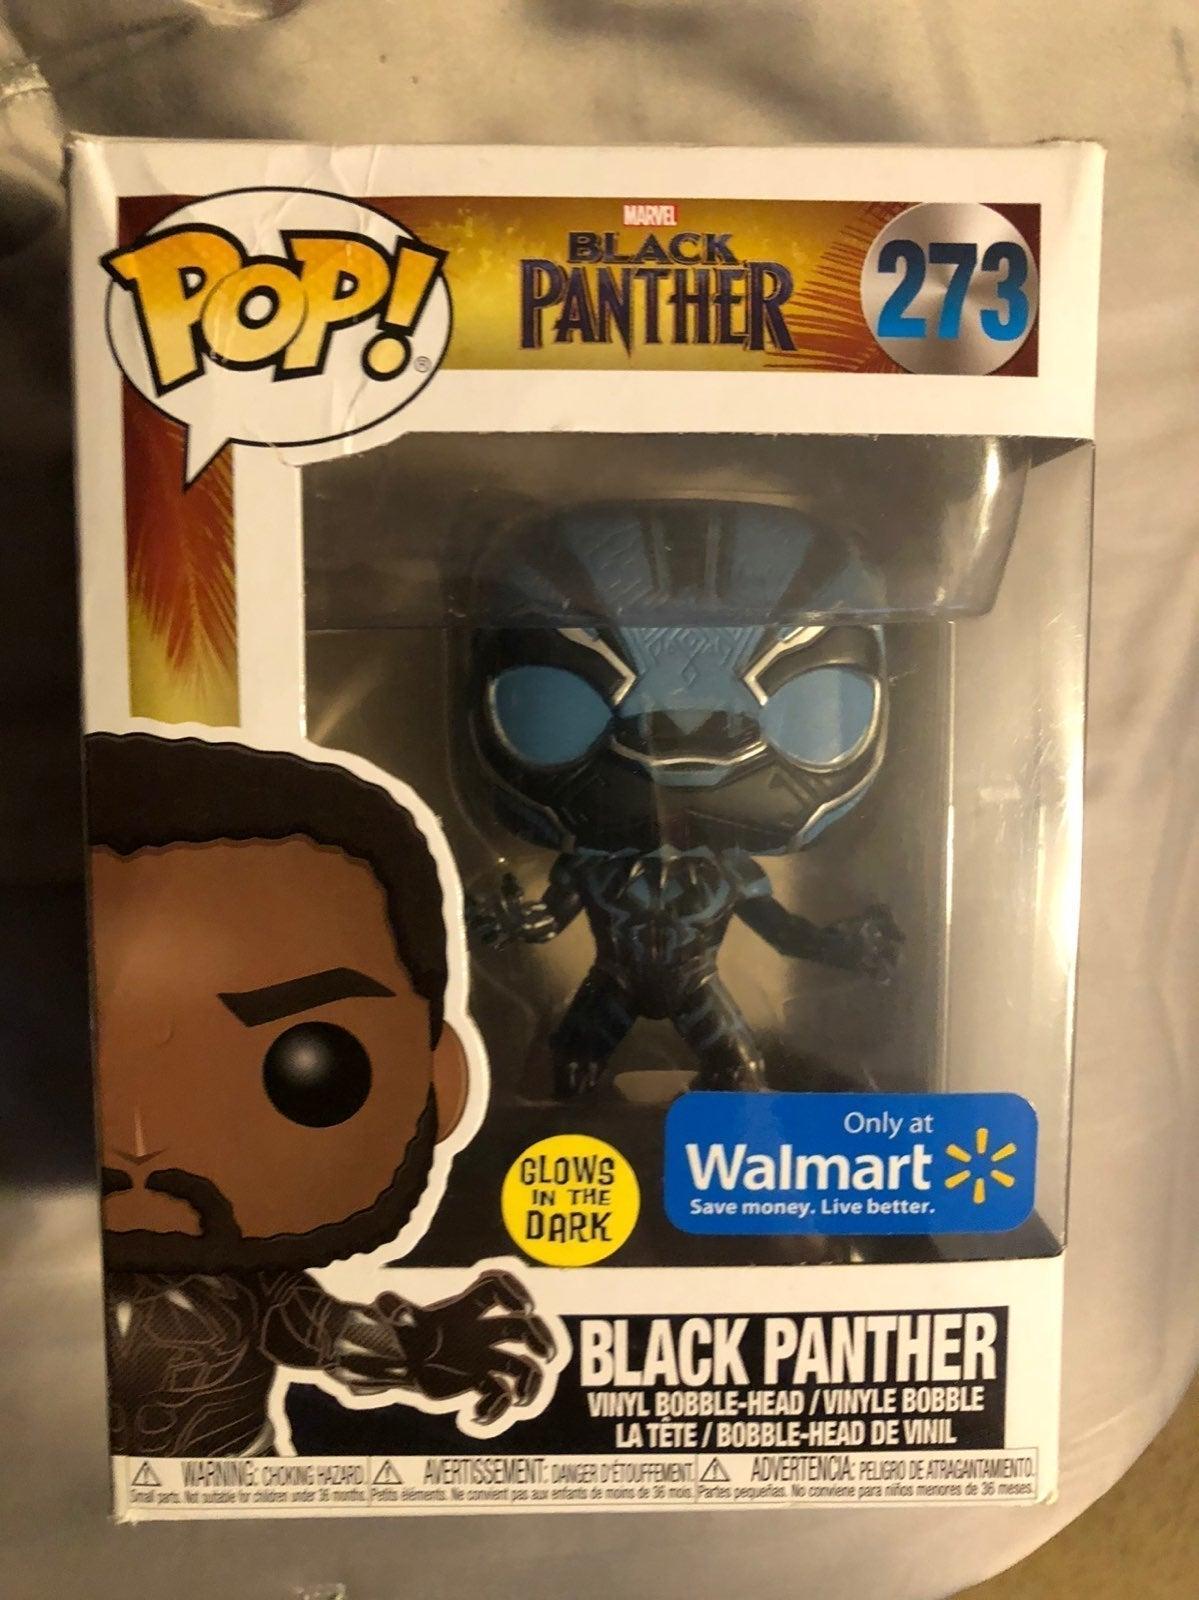 Black Panther Walmart Excl. Funko Pop